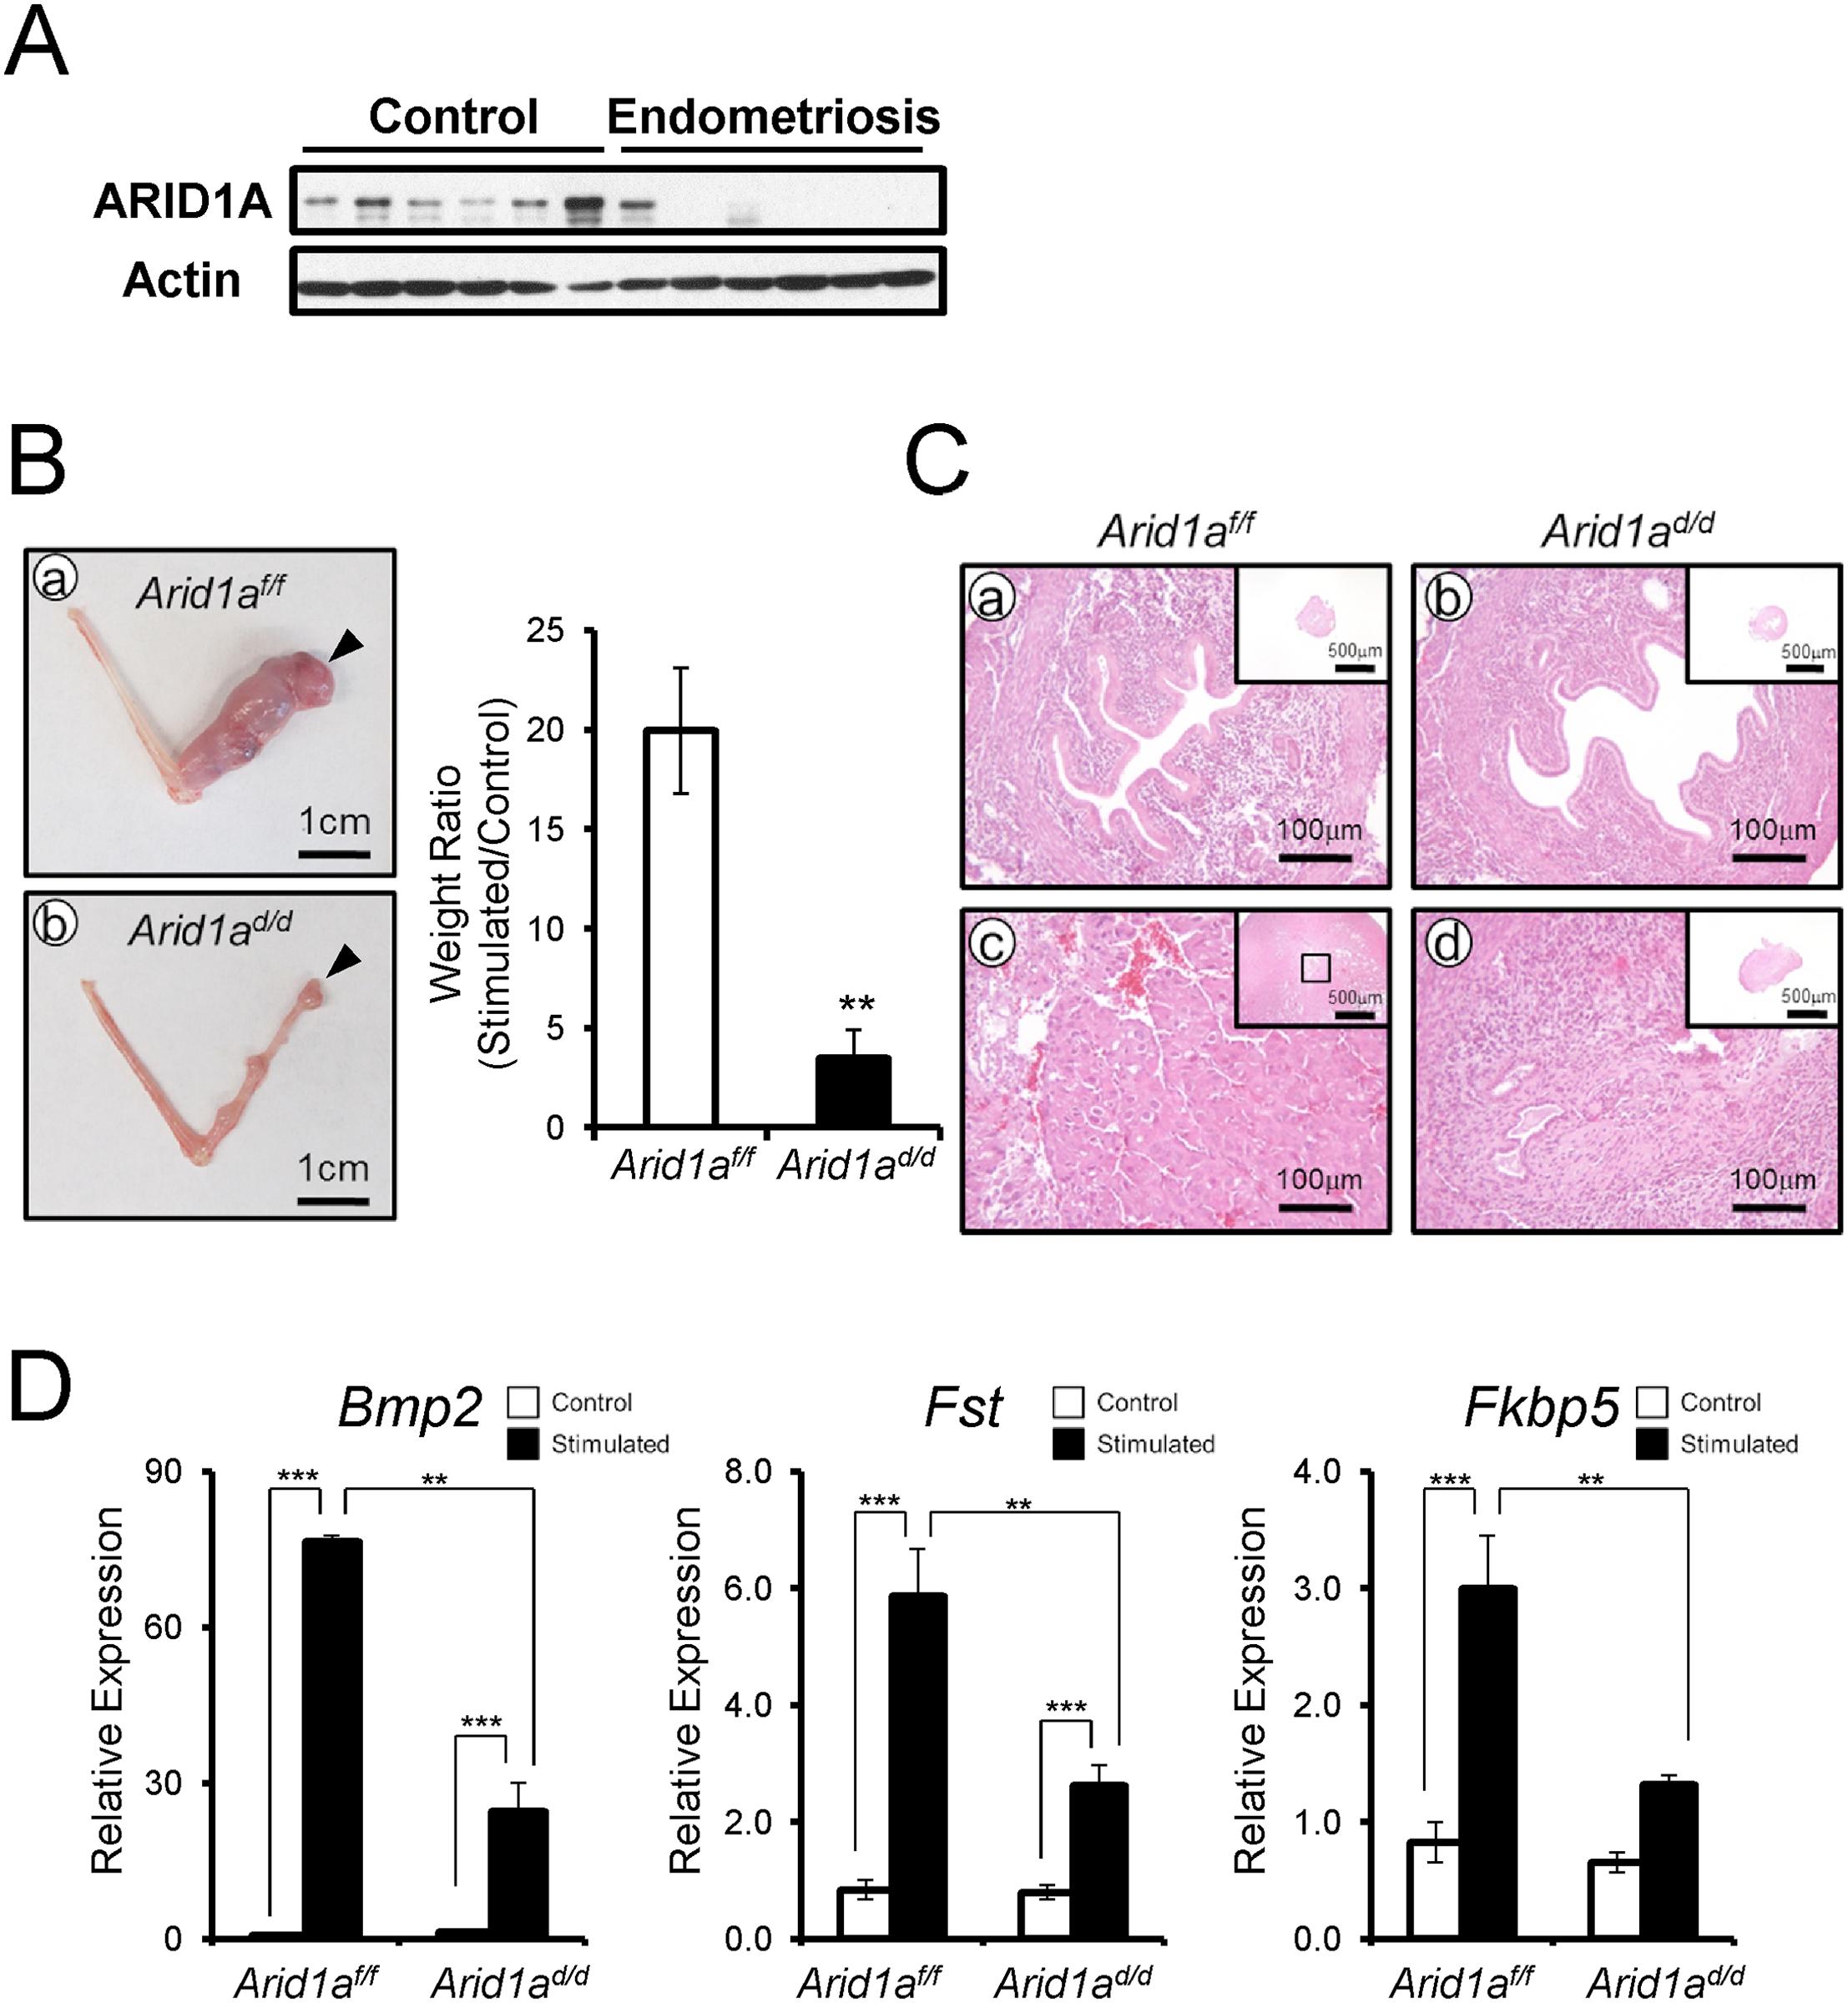 <i>Arid1a</i><sup><i>d/d</i></sup> mice exhibited an altered decidualization.